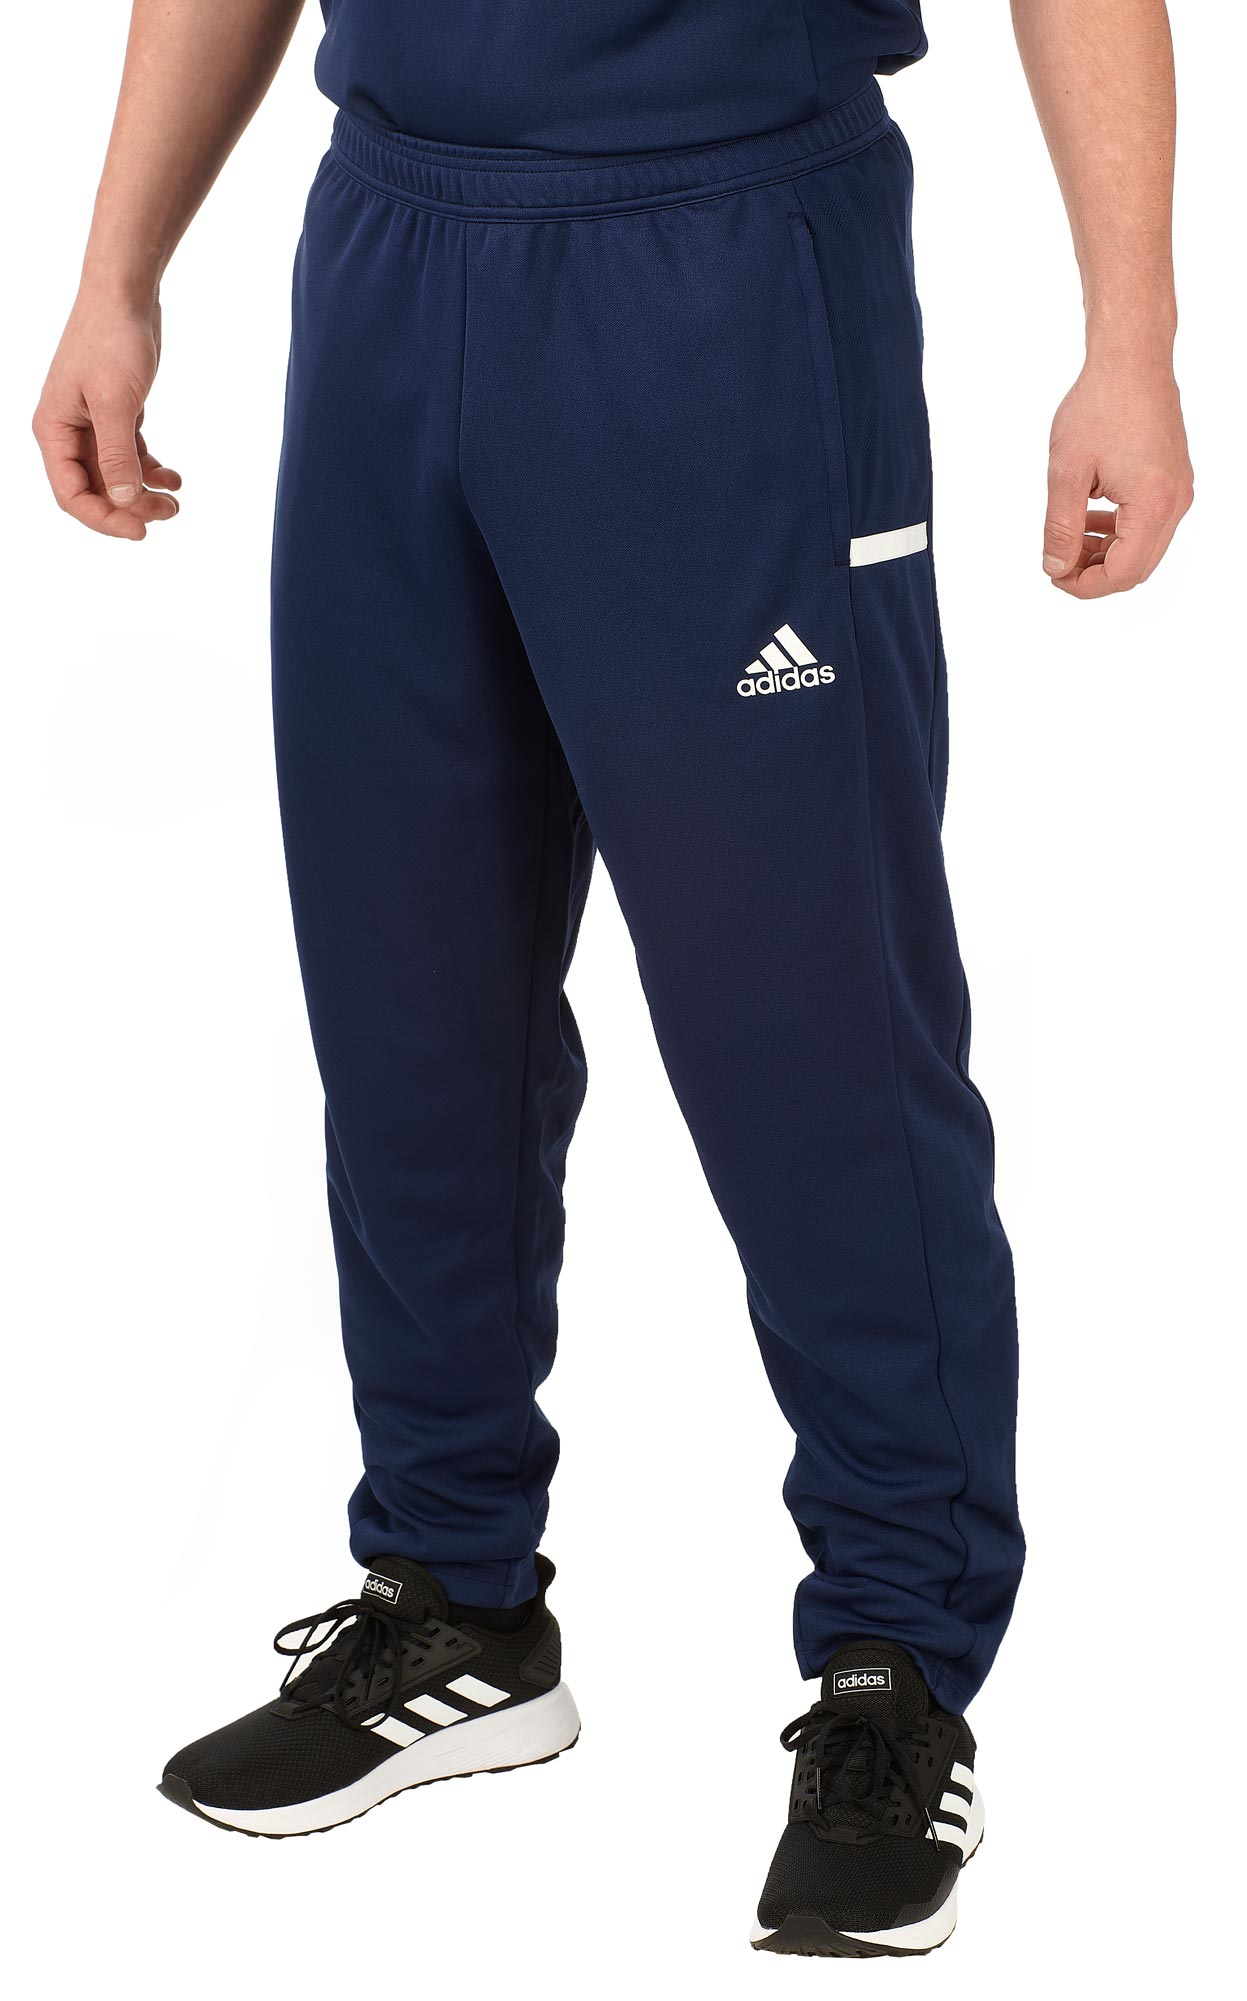 adidas T19 Trekking Pants Männer blauweiß, DY8809